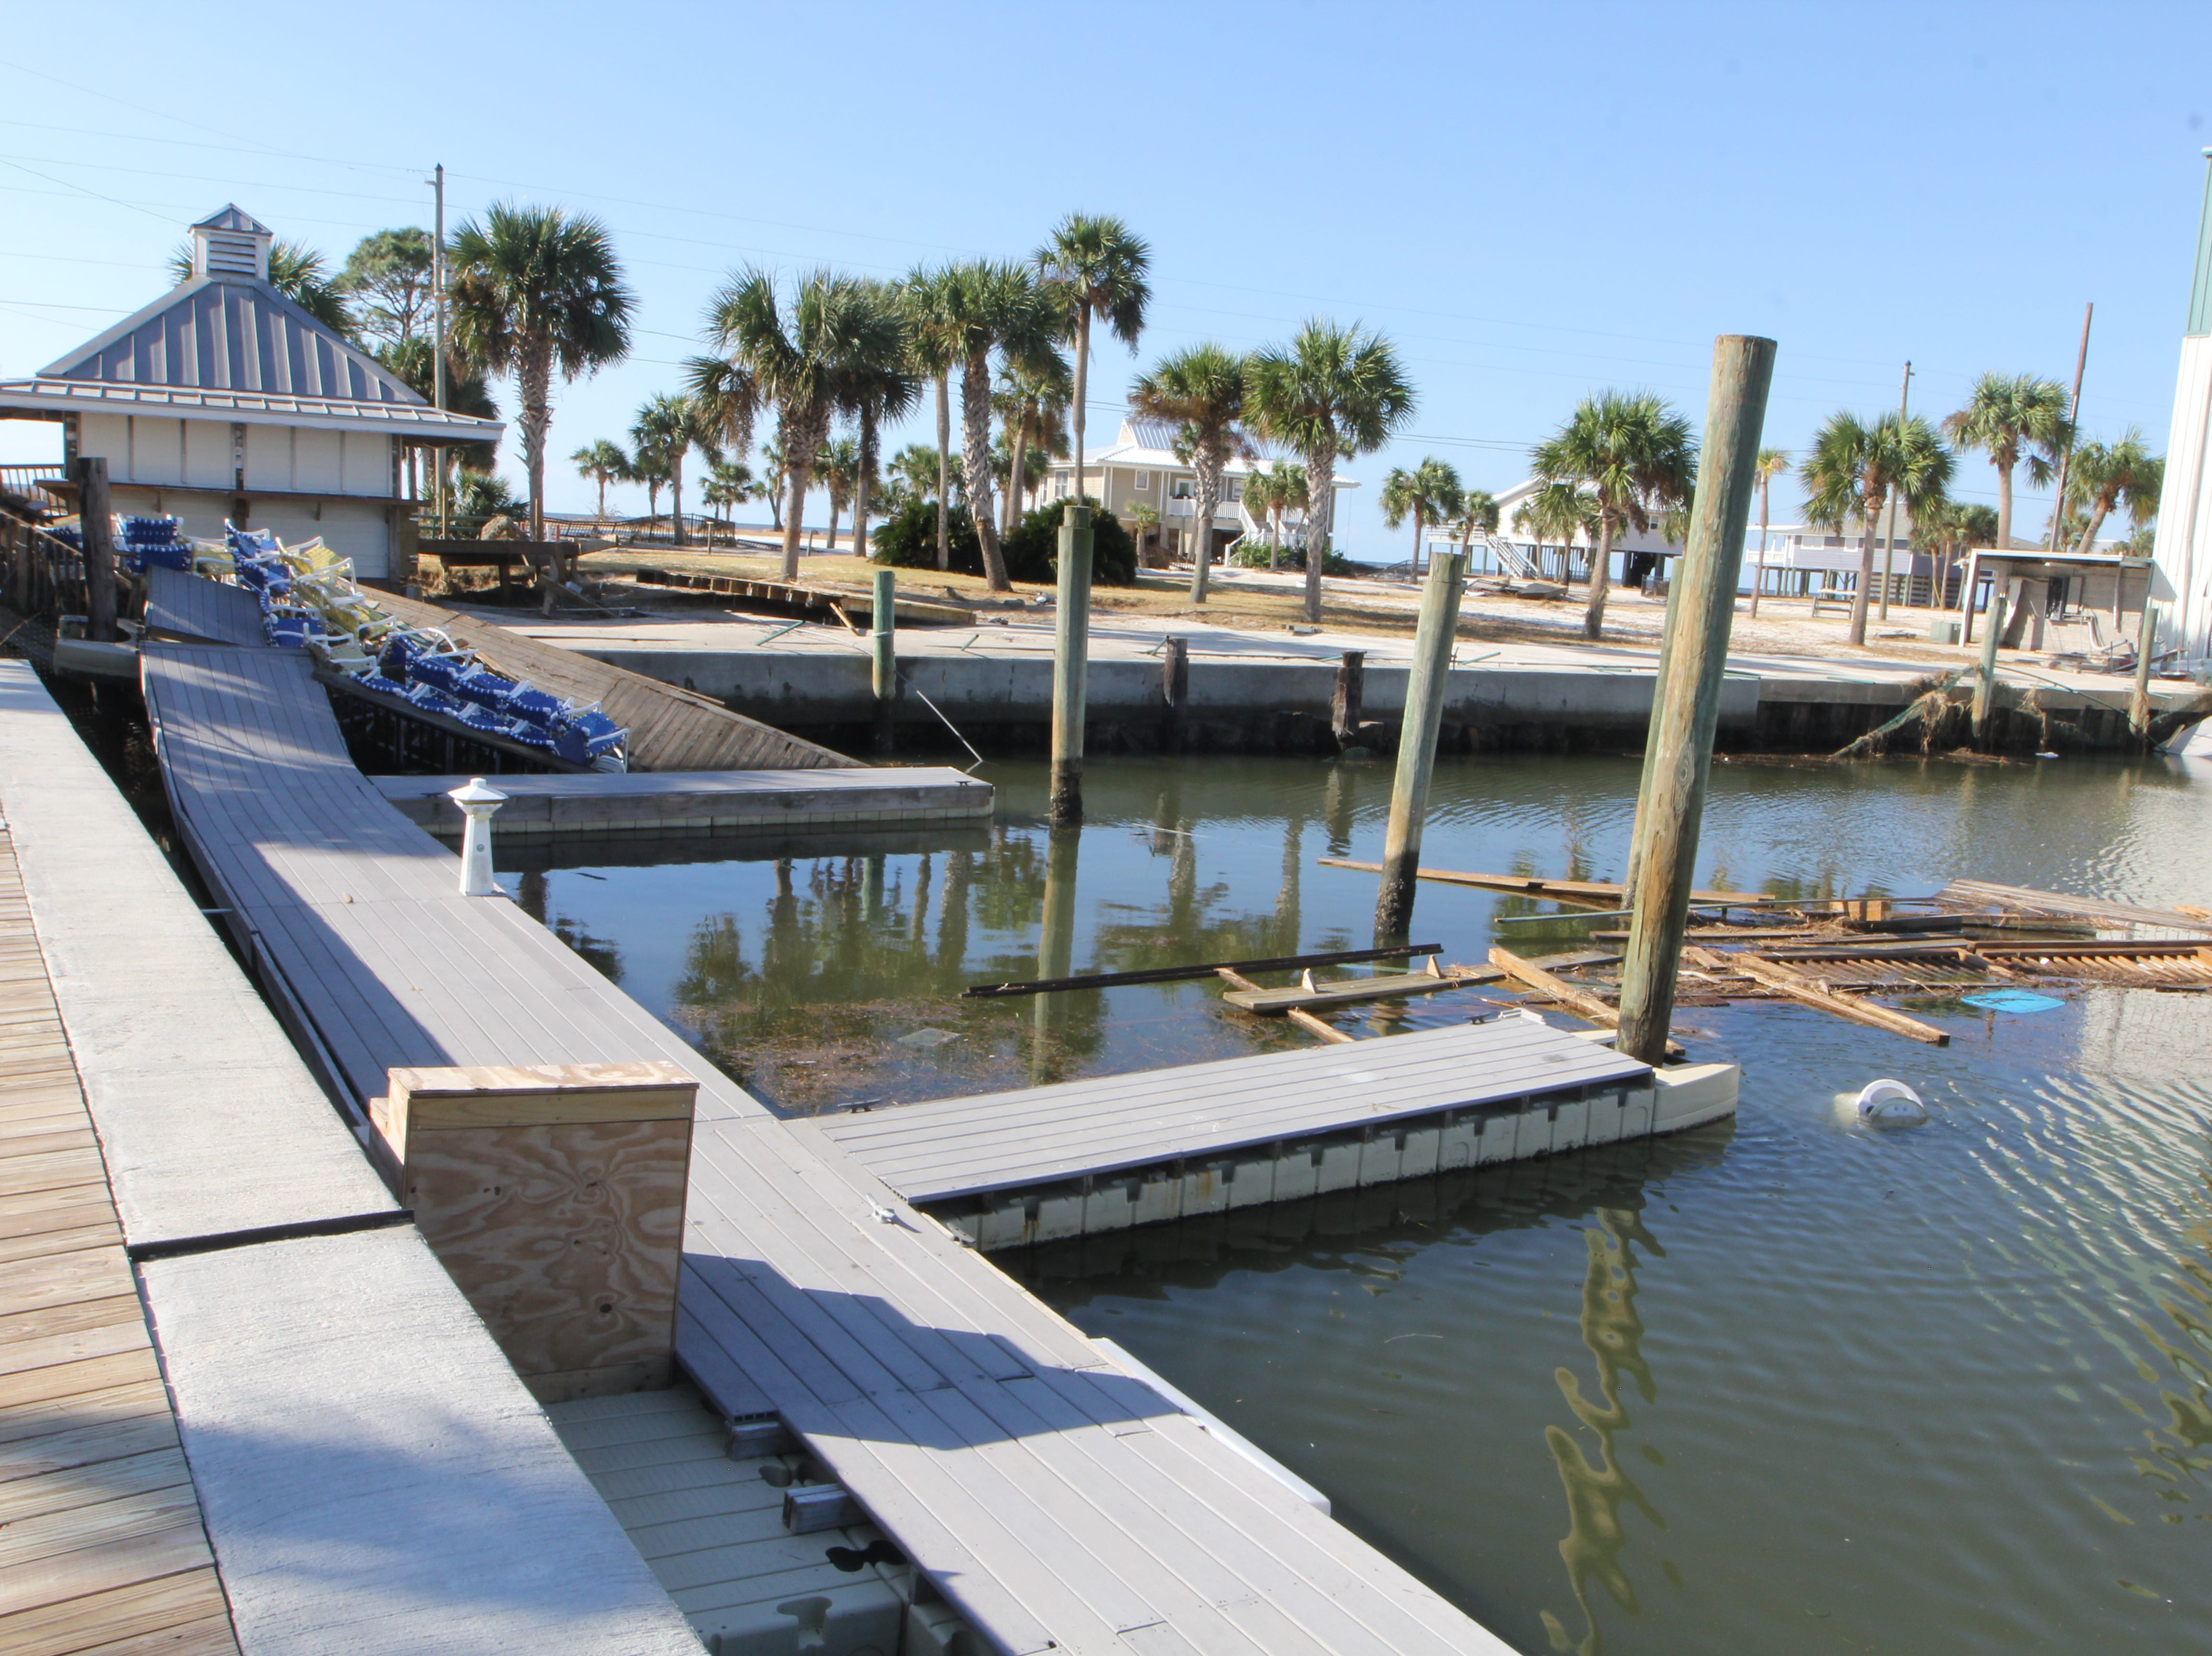 The Alligator Point Marina suffered major damage during Hurricane Michael.